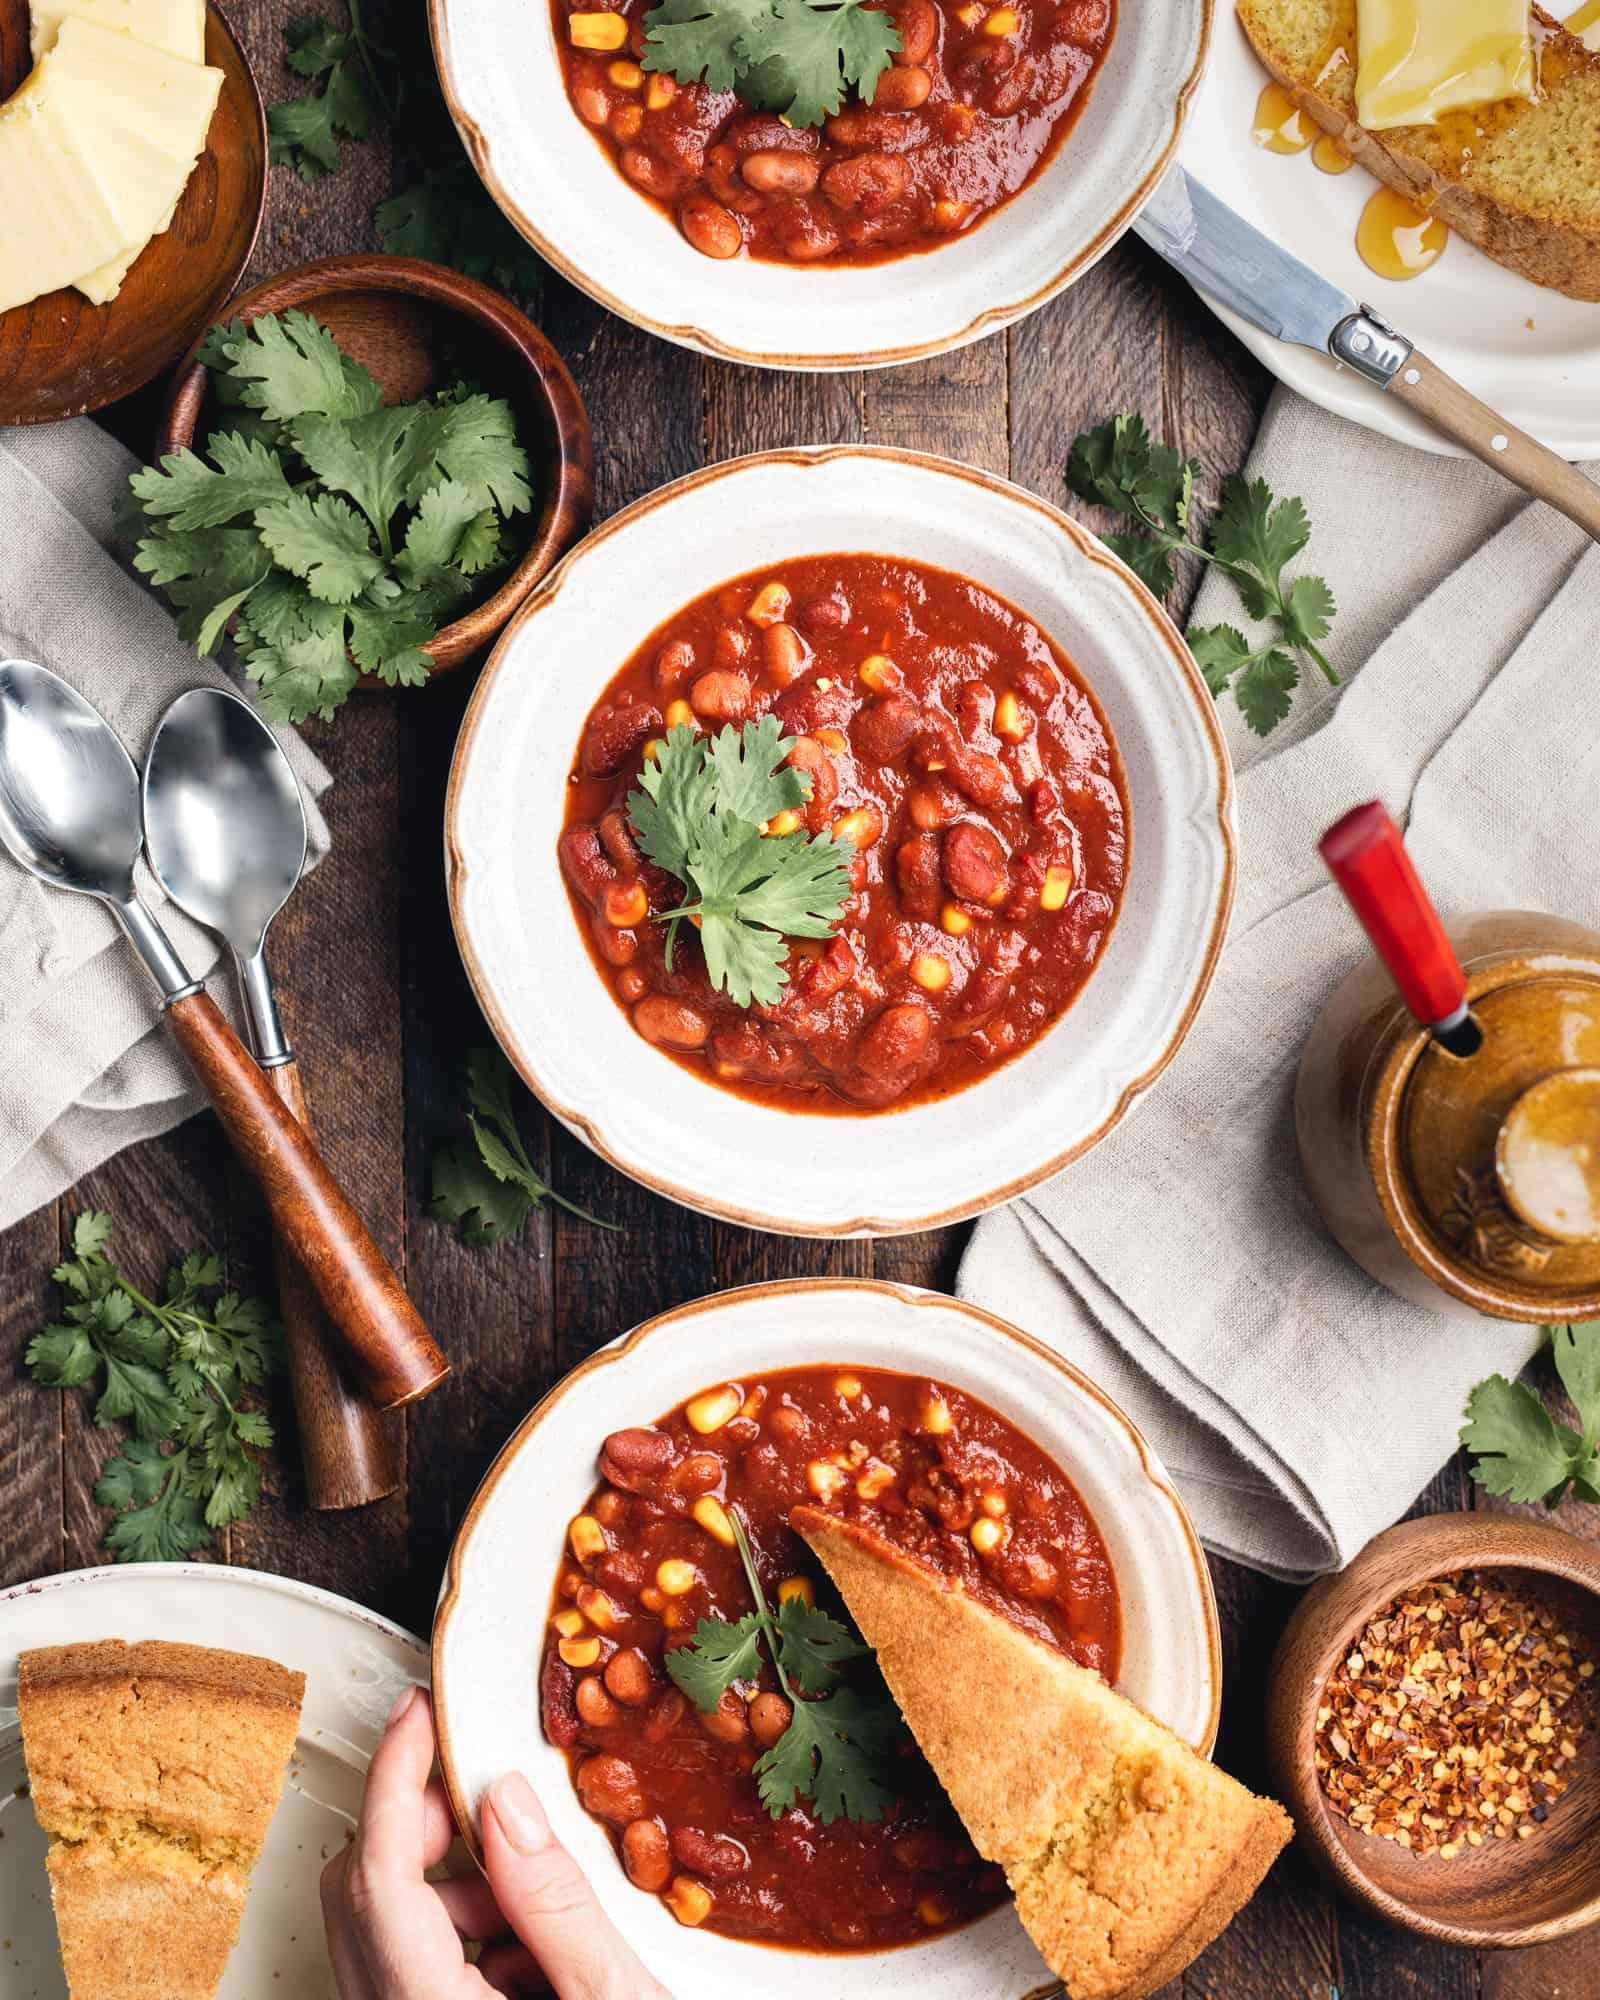 Vegan Chili in three bowls with cornbread and honey